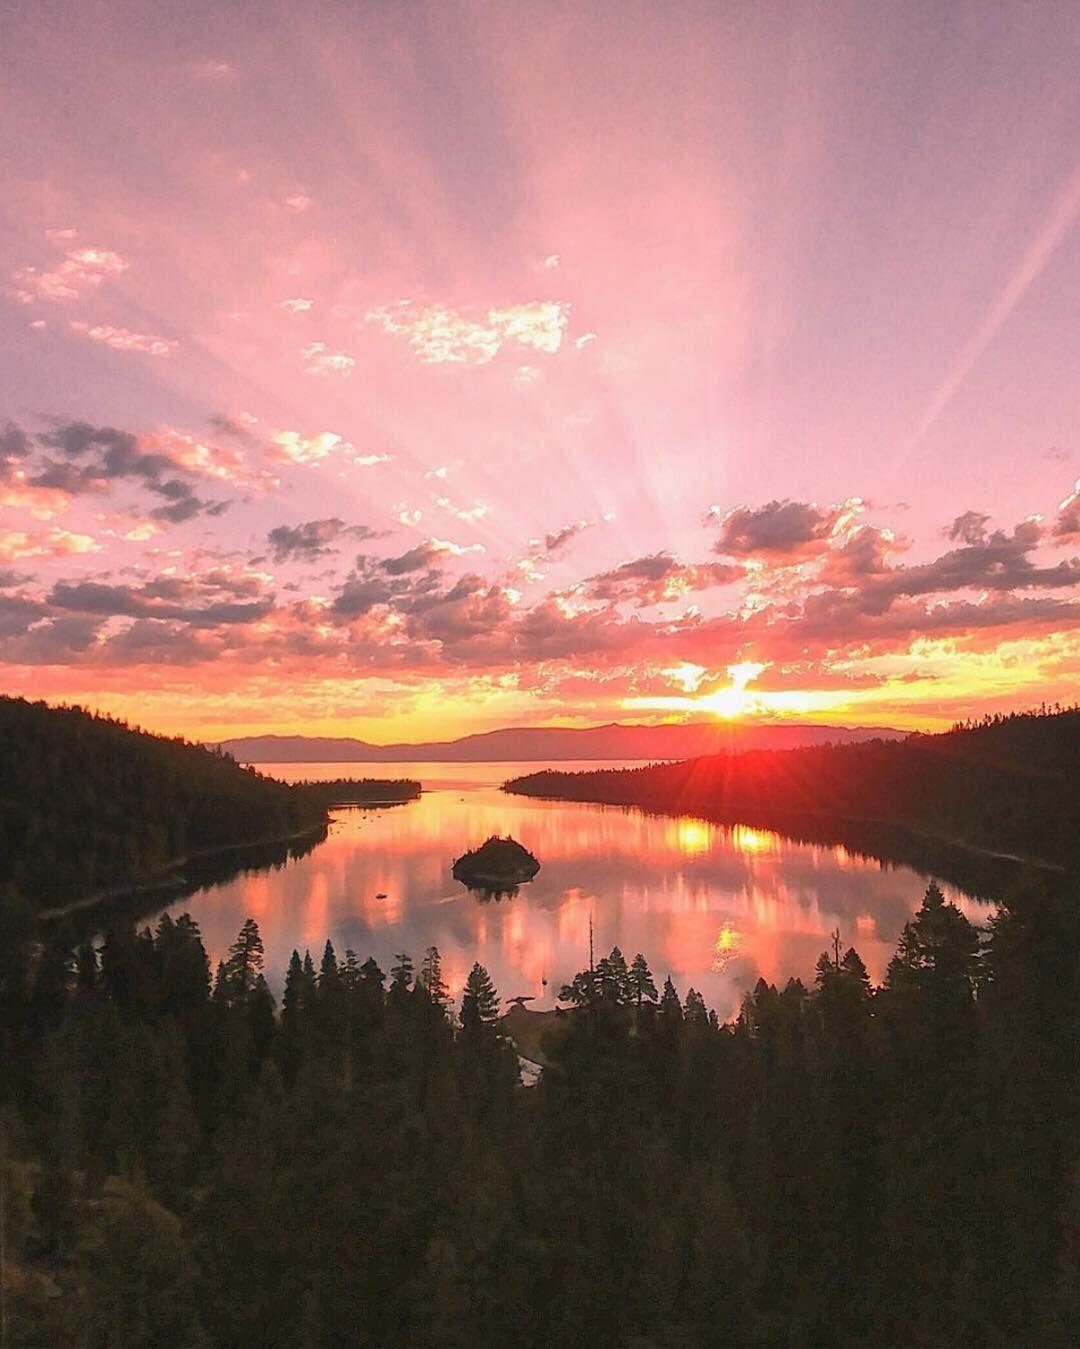 Lake tahoe sunset travel channel pinterest - Lake Tahoe The Sunrisesunsettravel